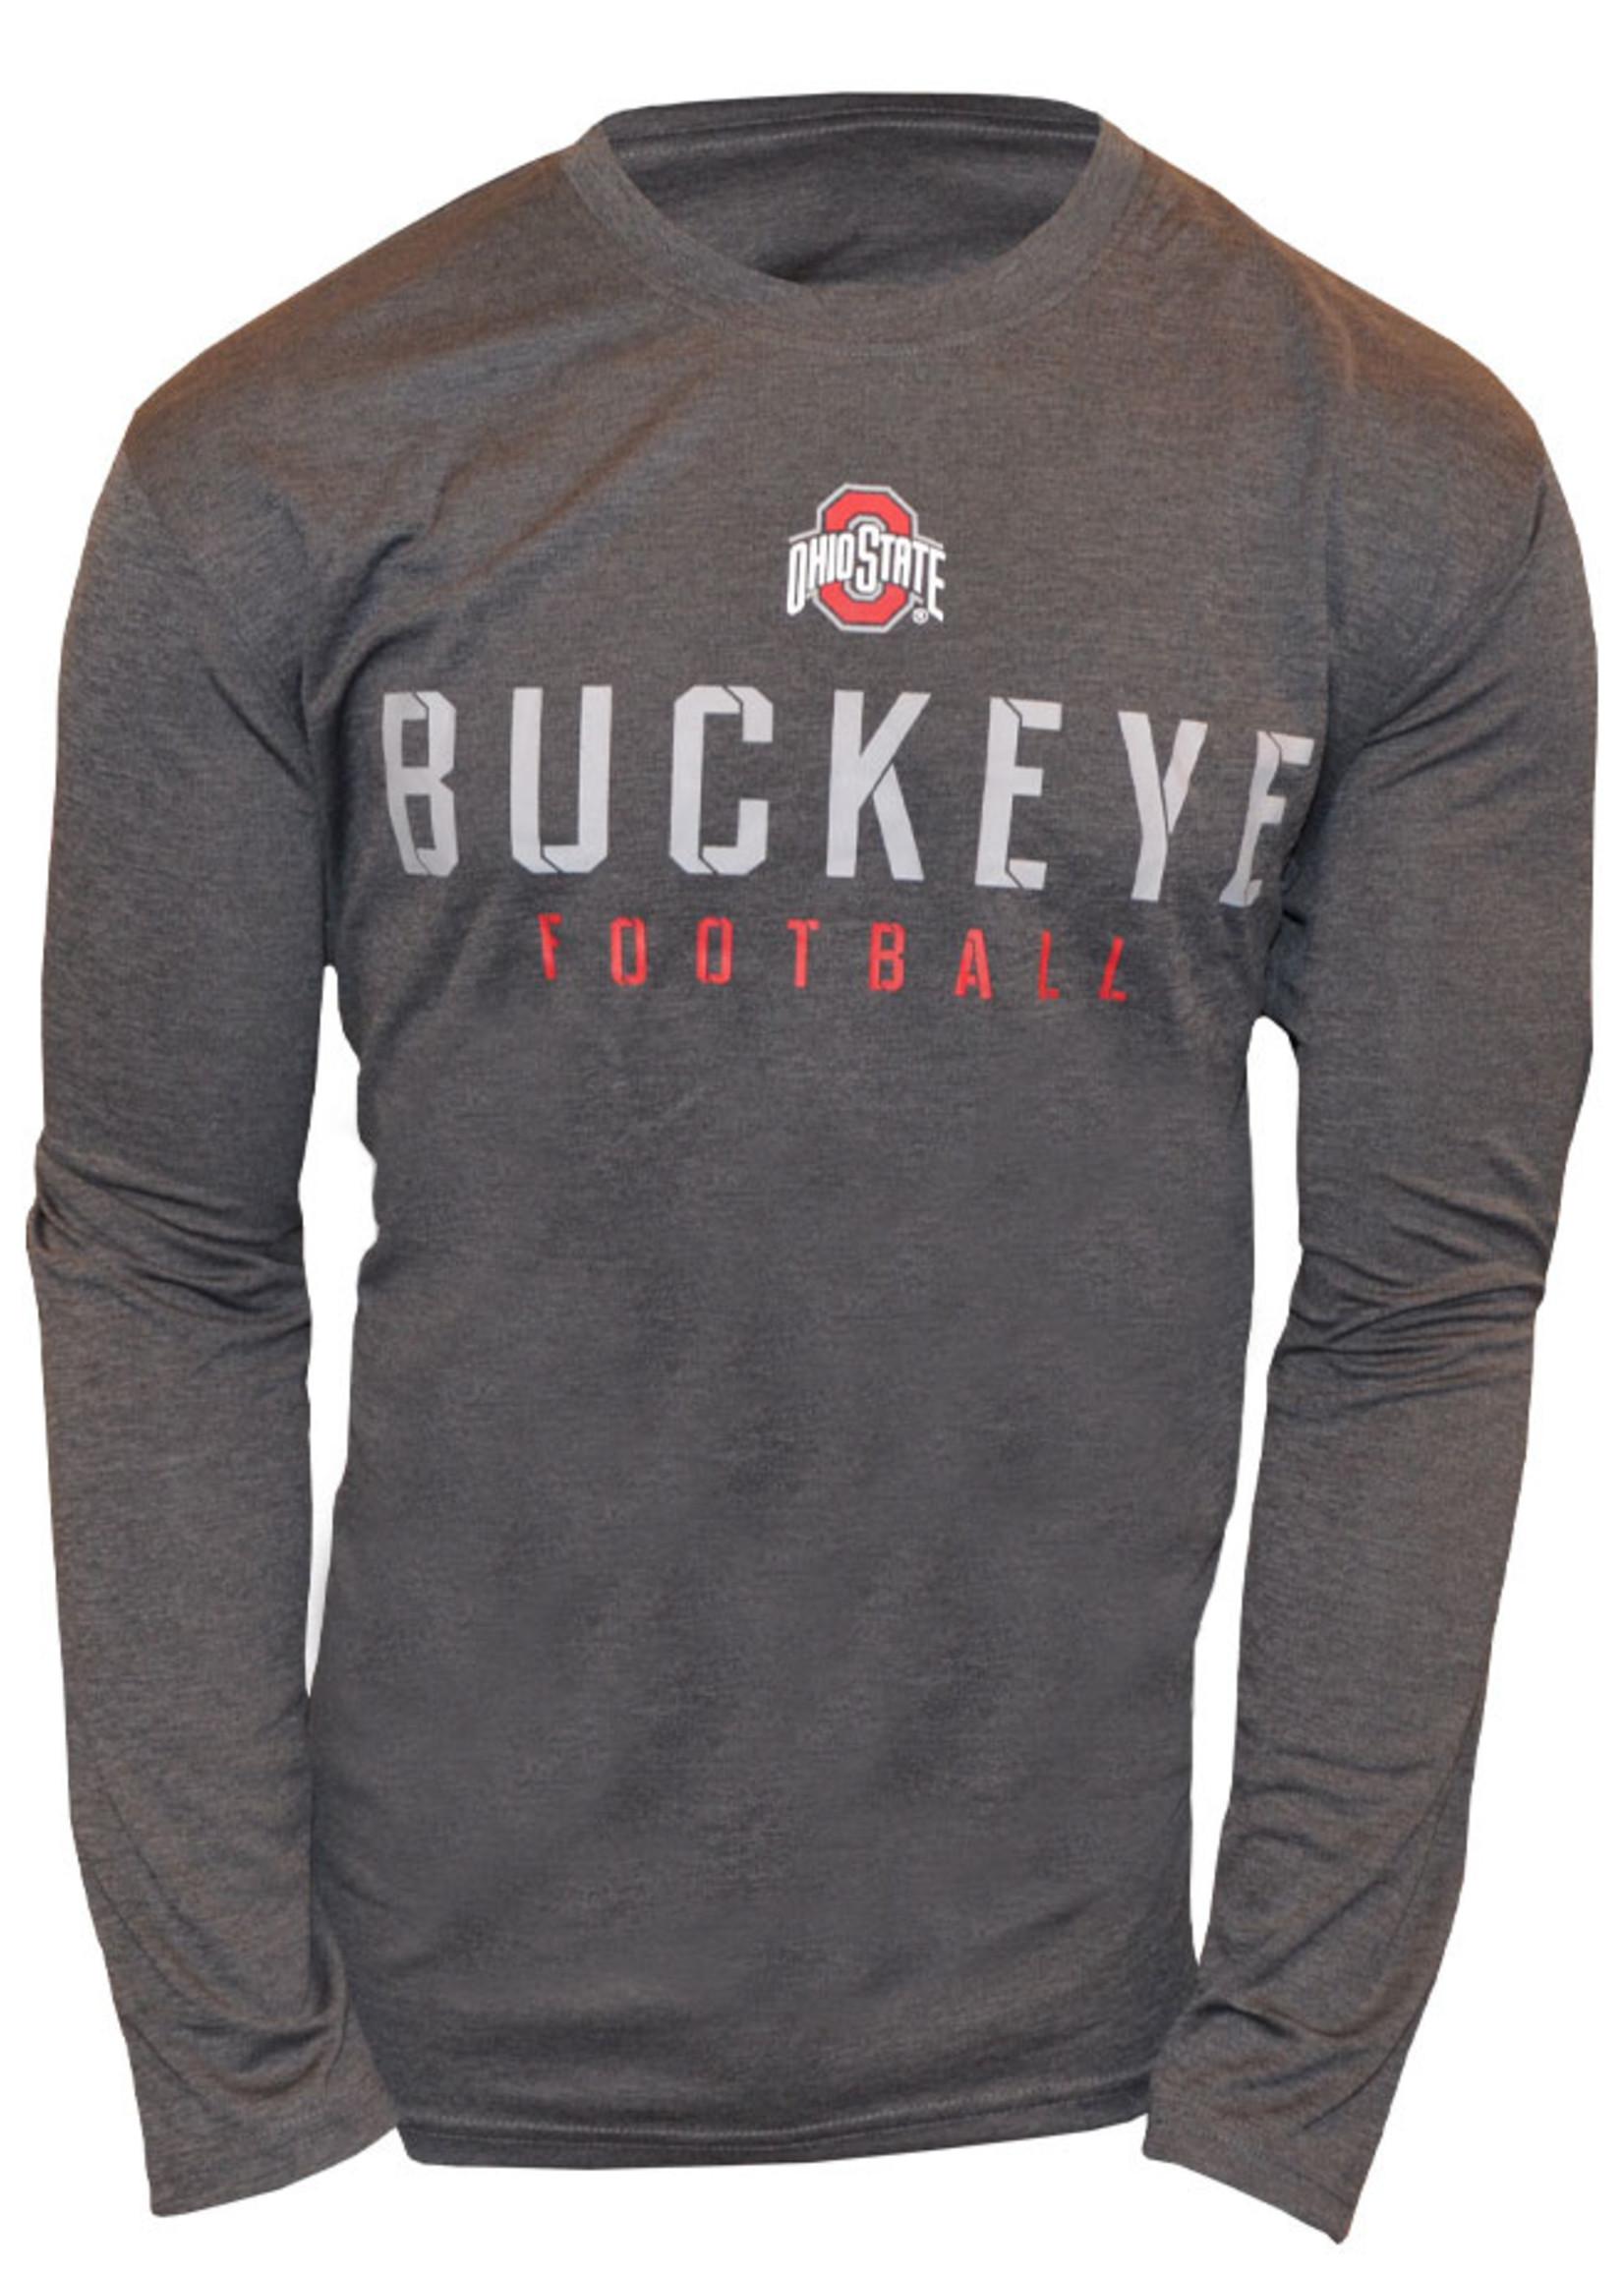 Ohio State Buckeyes Football Long Sleeve Tee